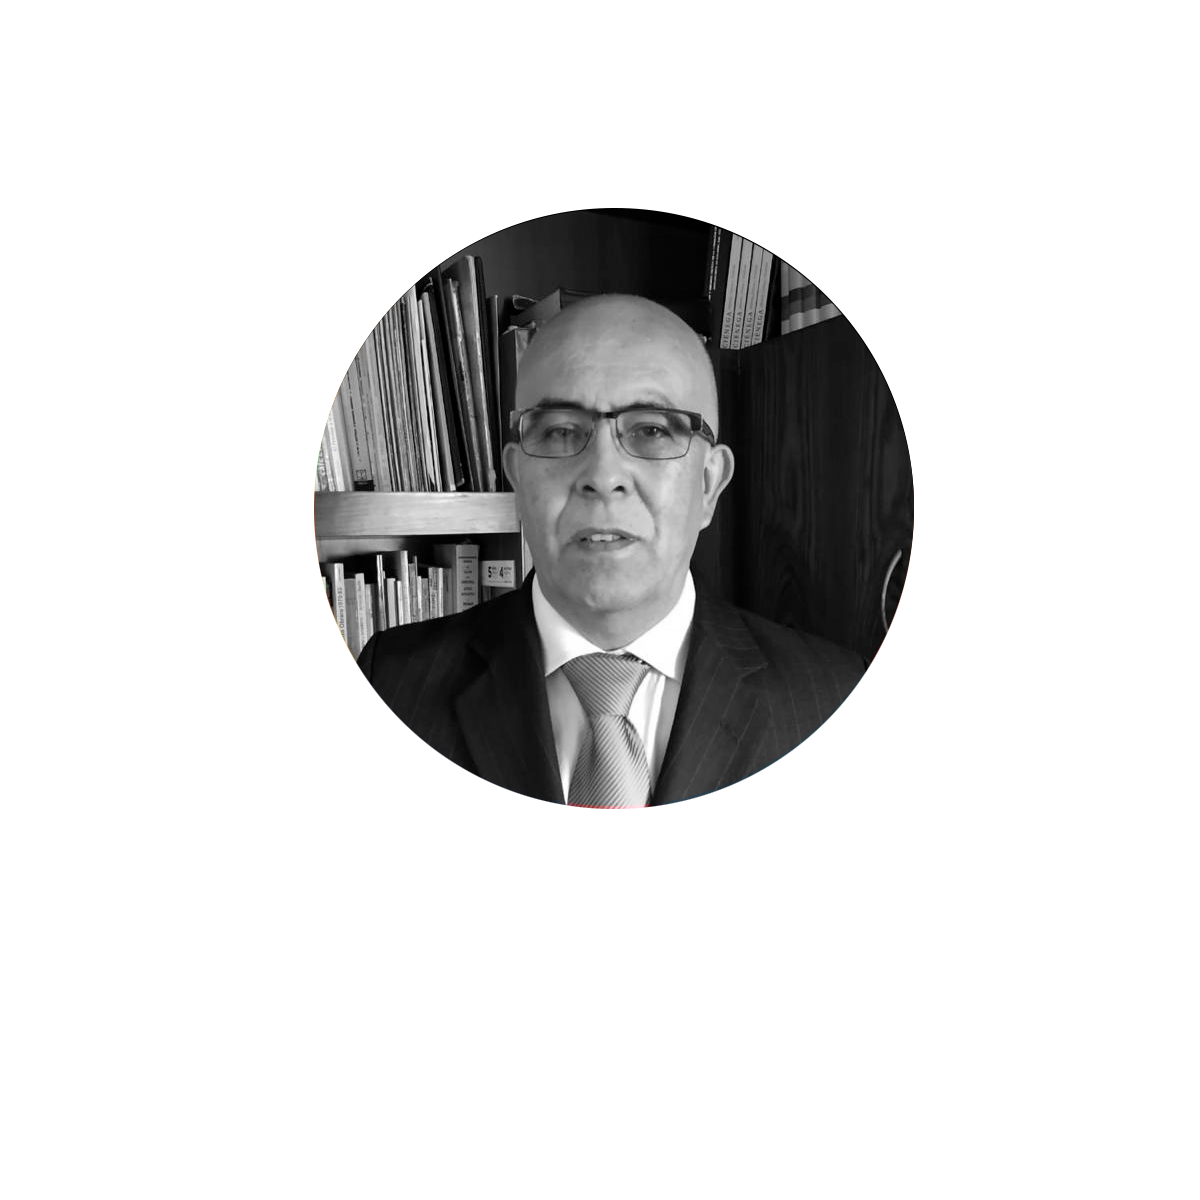 Liborio Eugenio González Cepeda